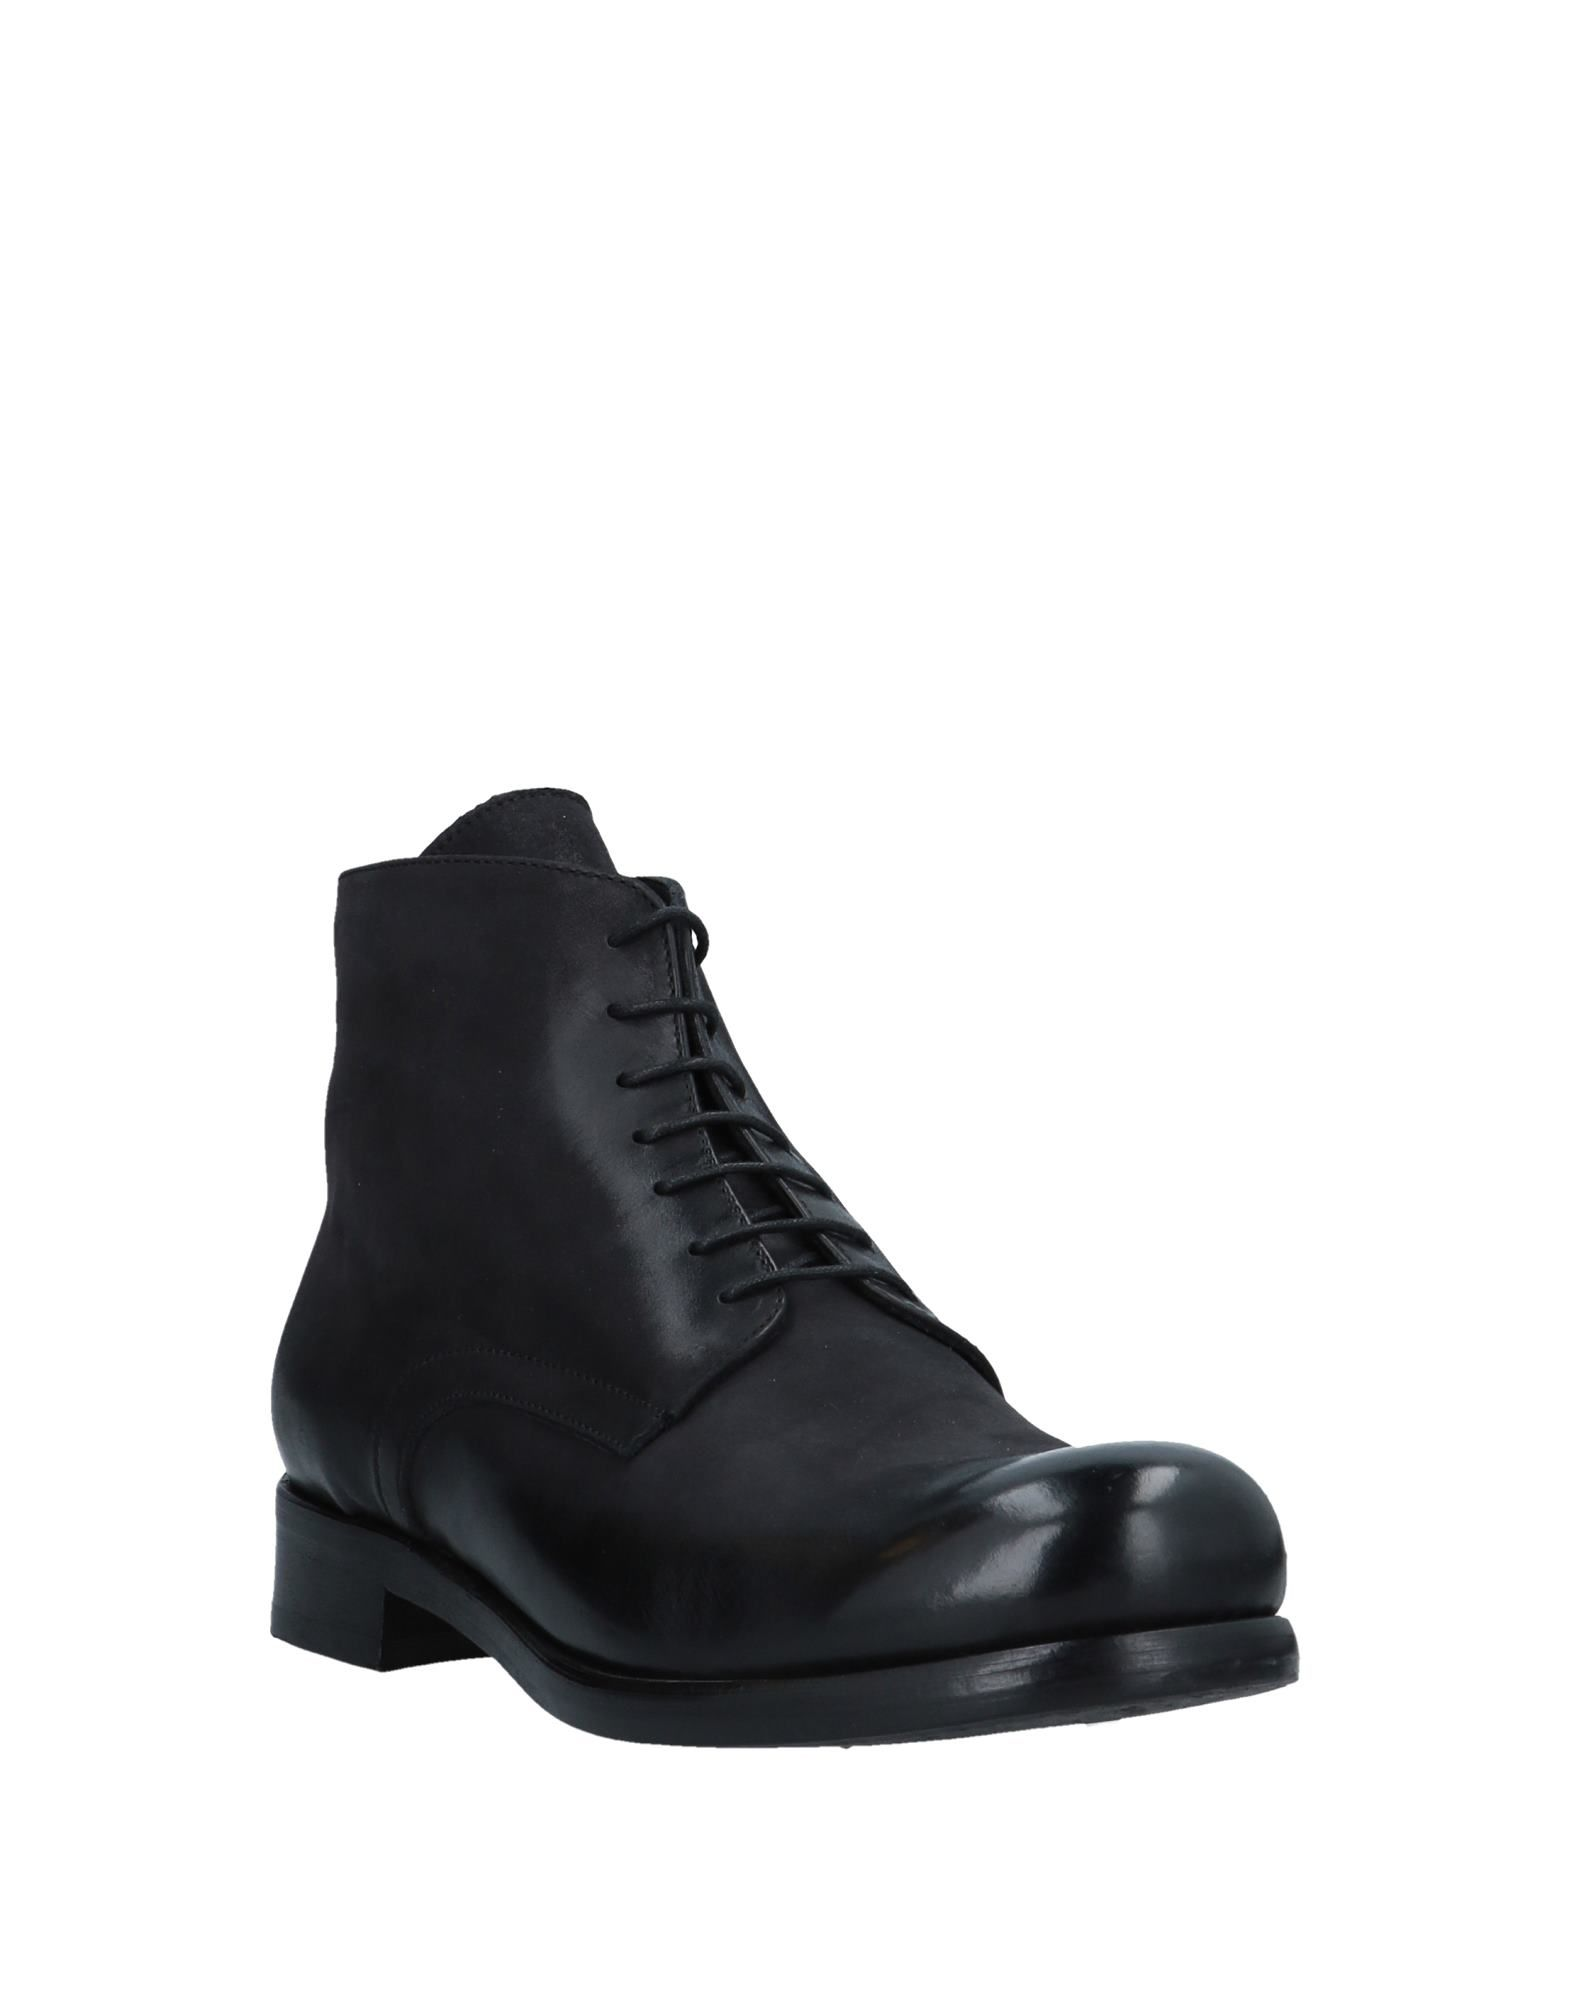 2f42505e073d ... Rabatt Stiefelette echte Schuhe Savio Barbato Stiefelette Rabatt Herren  11536879KV 870d91 ...